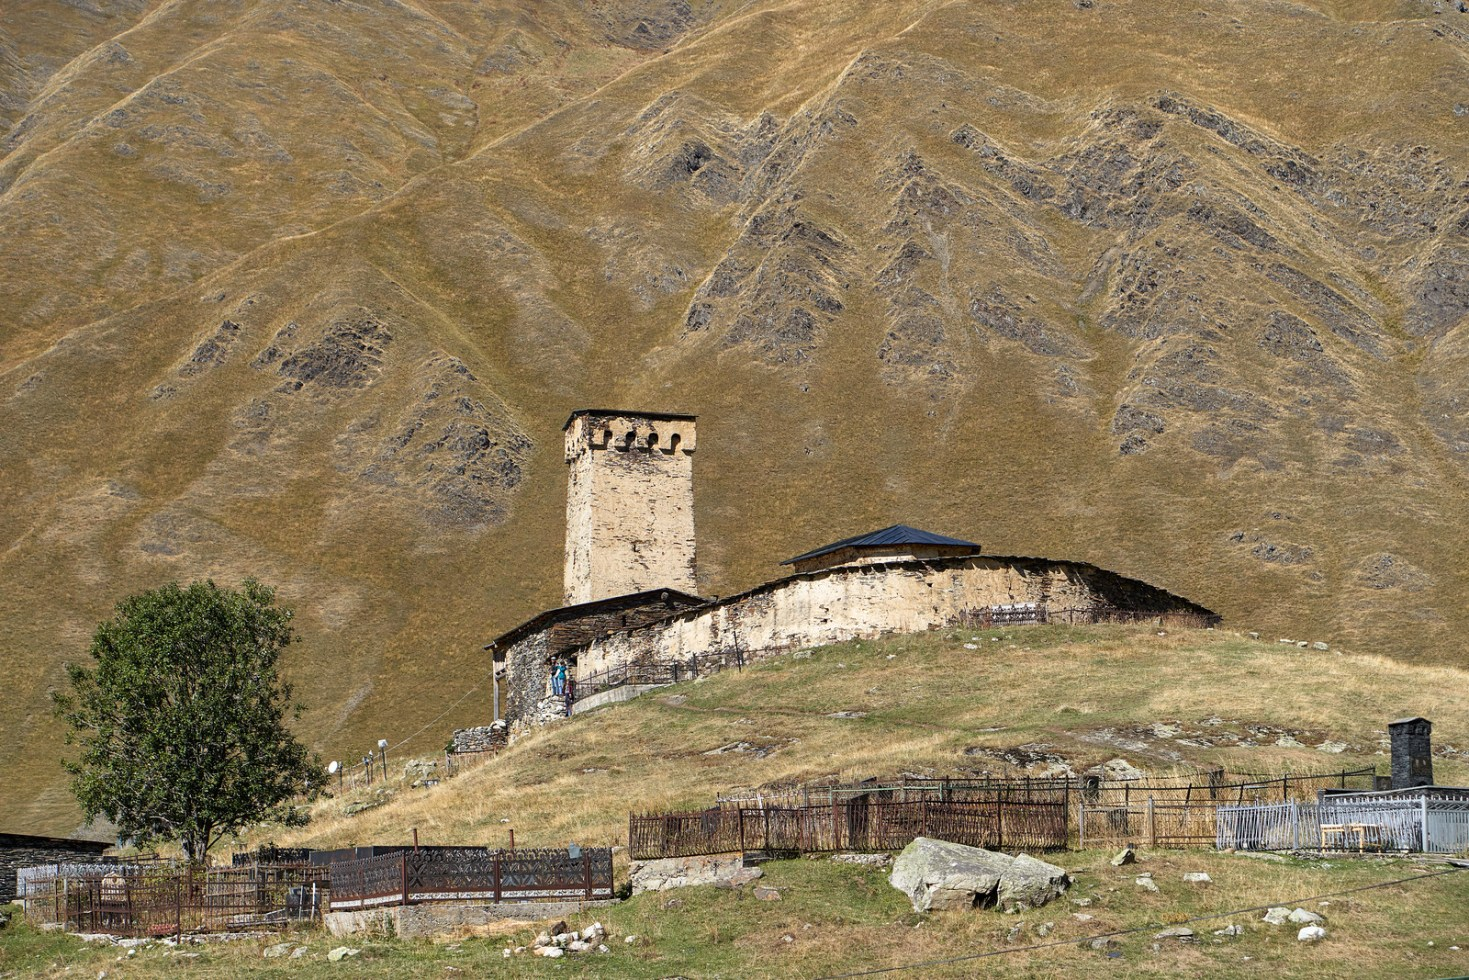 Graveyard in Ushguli